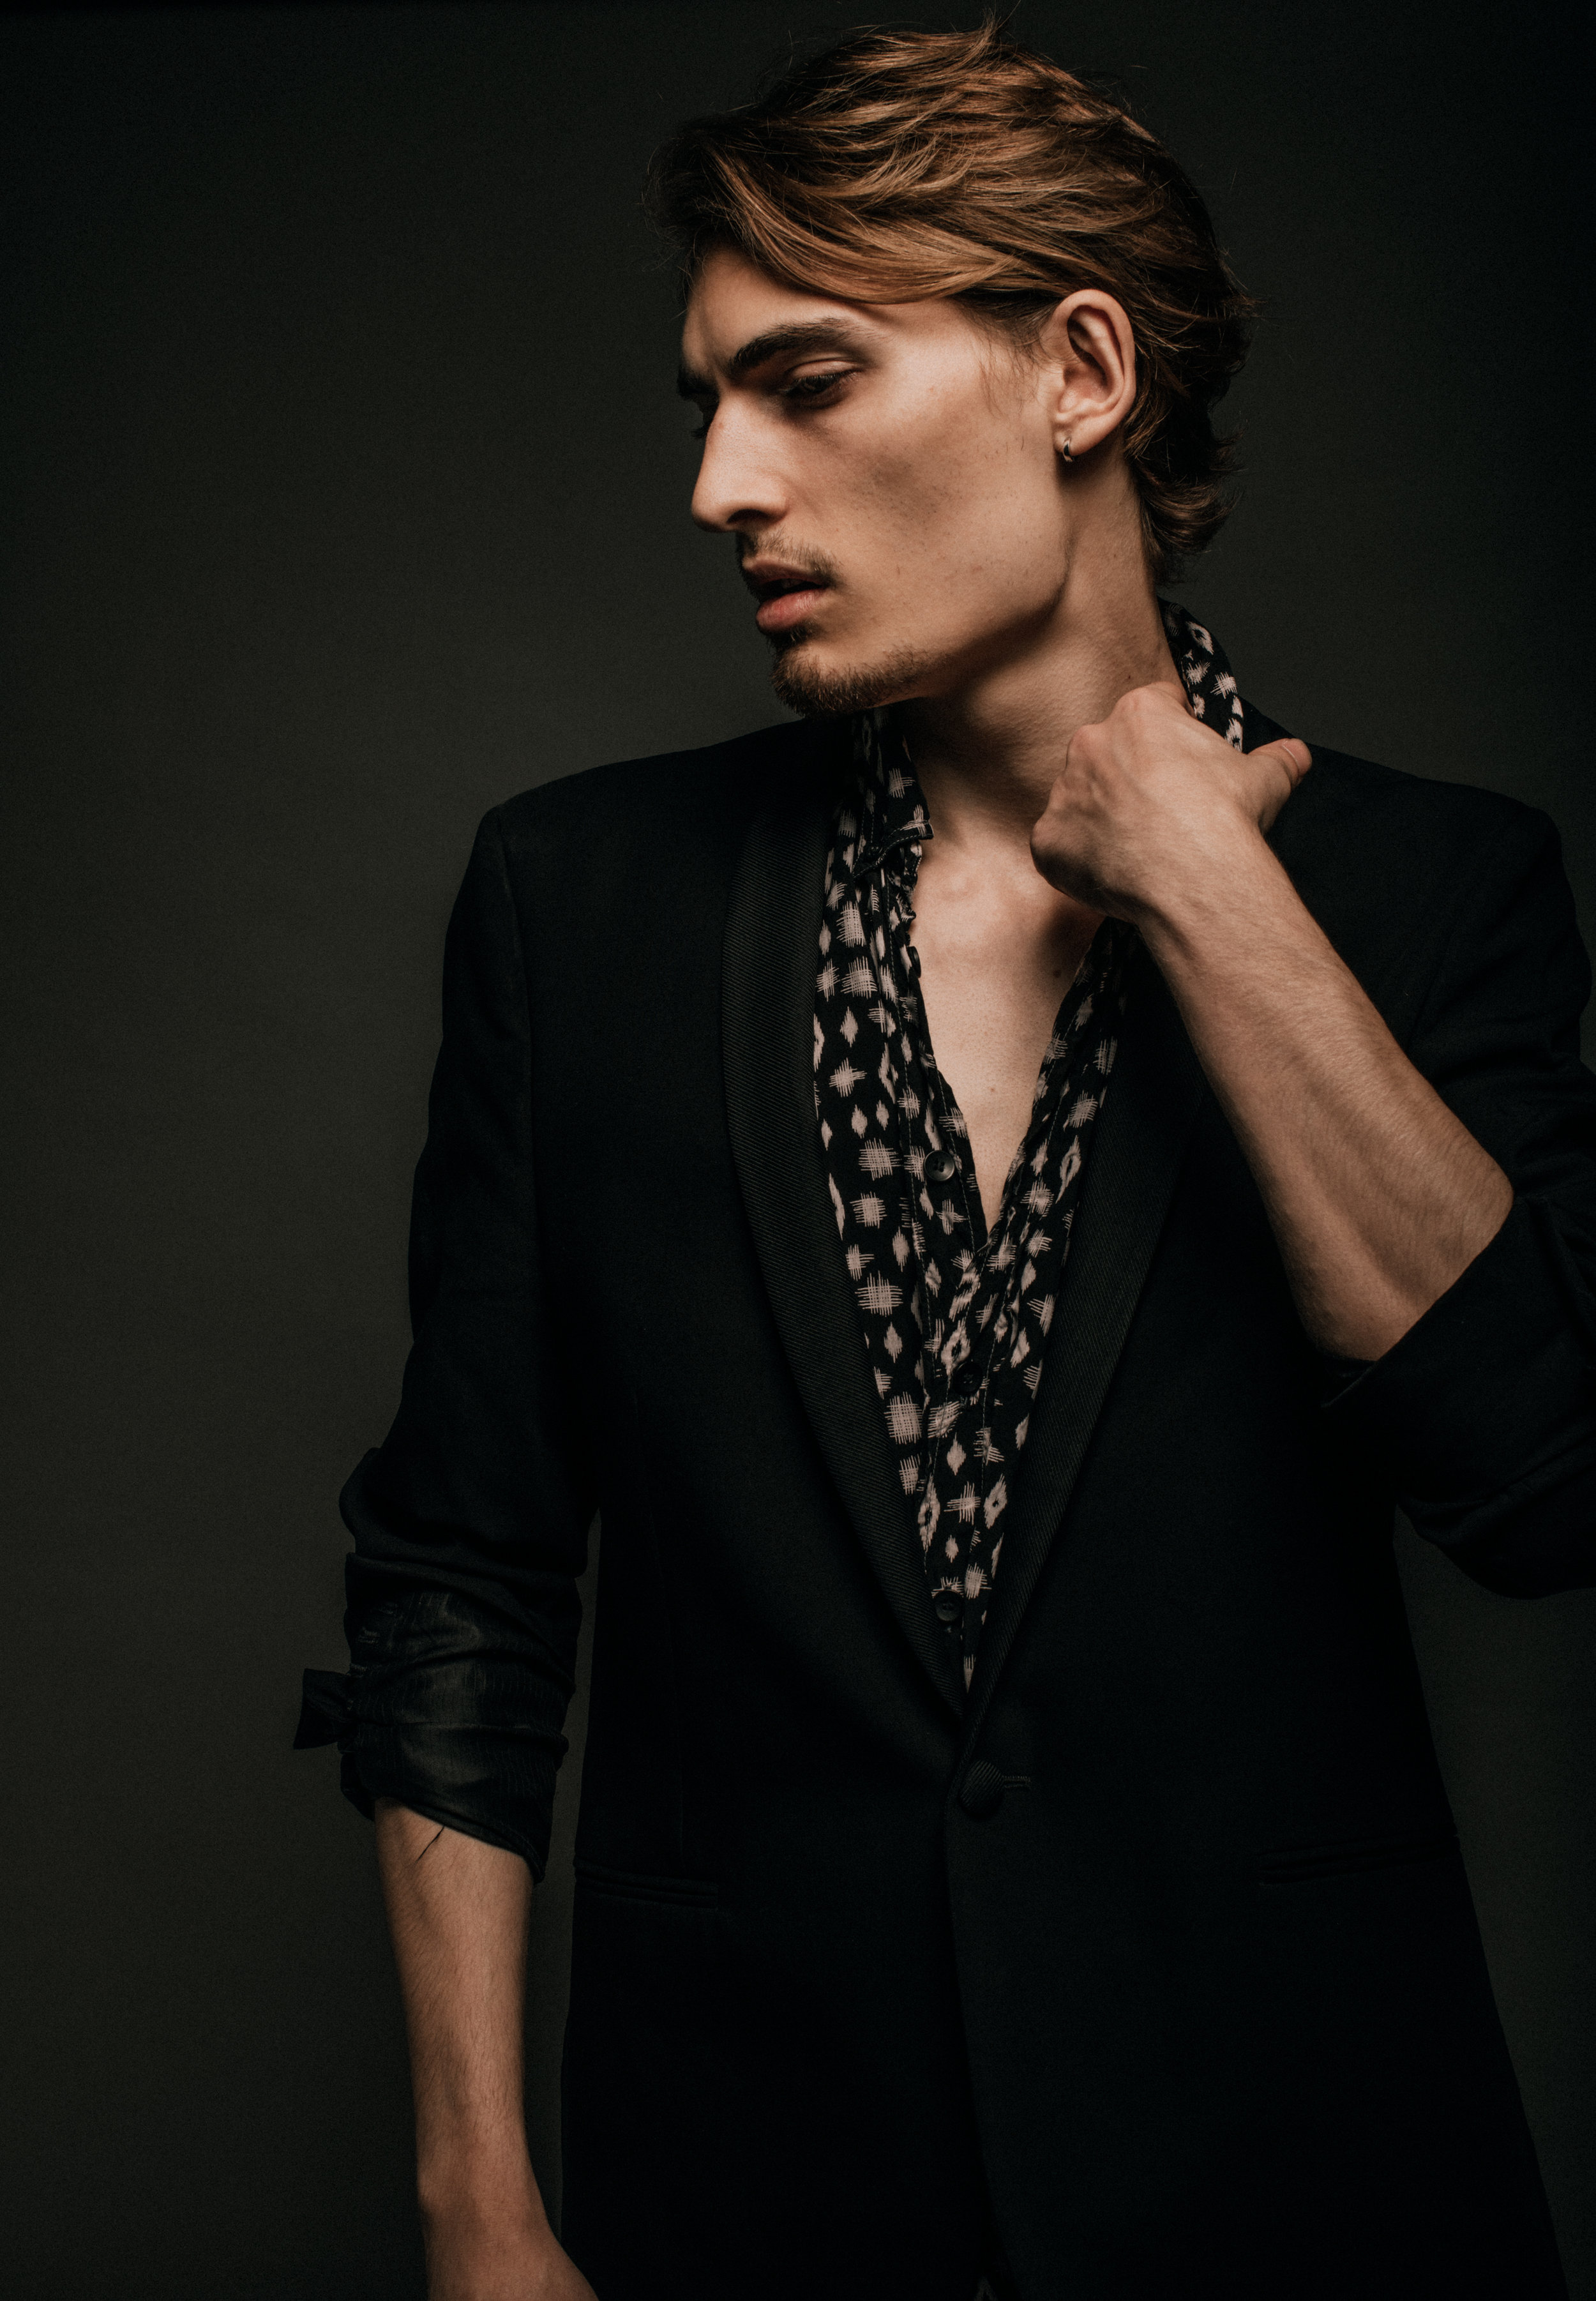 Trevor Drury, musician and international model